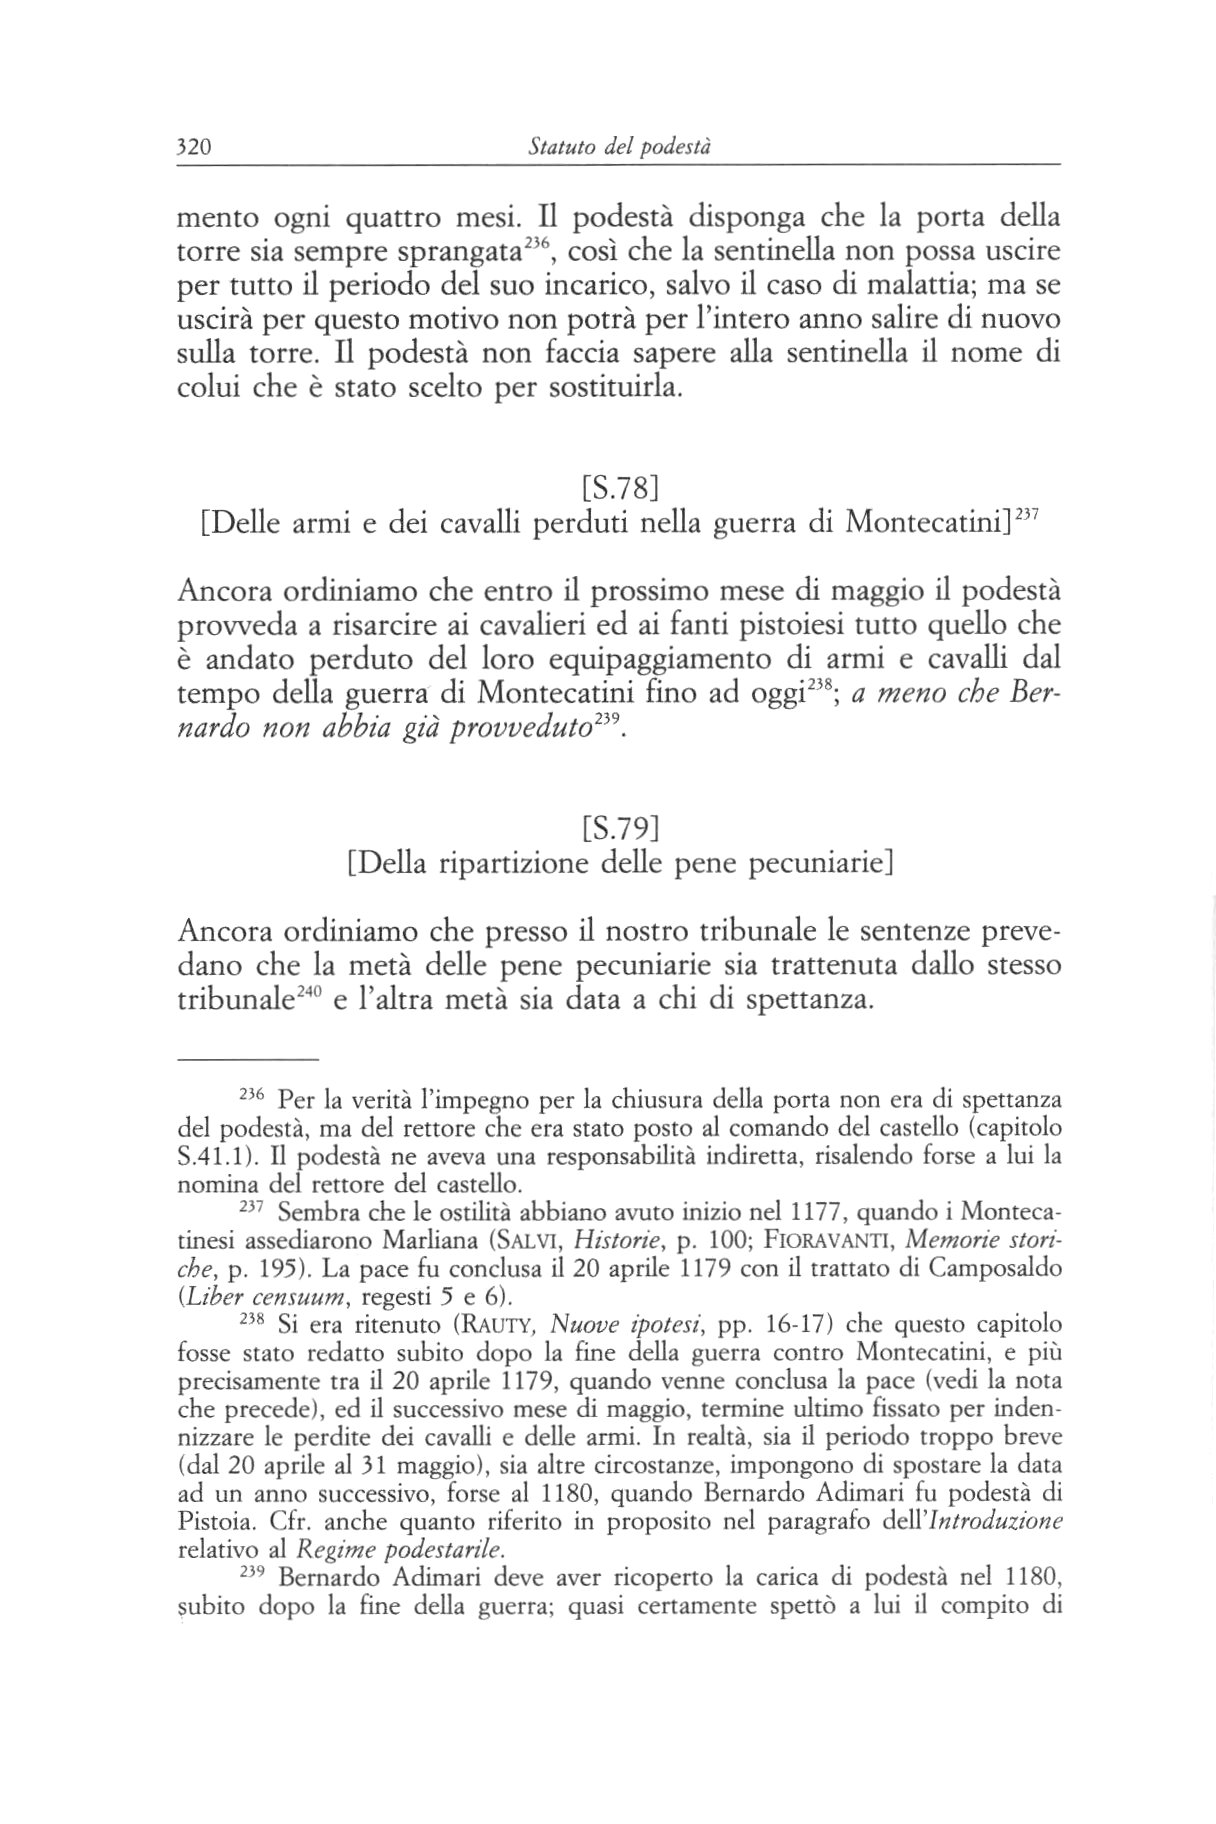 statuti pistoiesi del sec.XII 0320.jpg